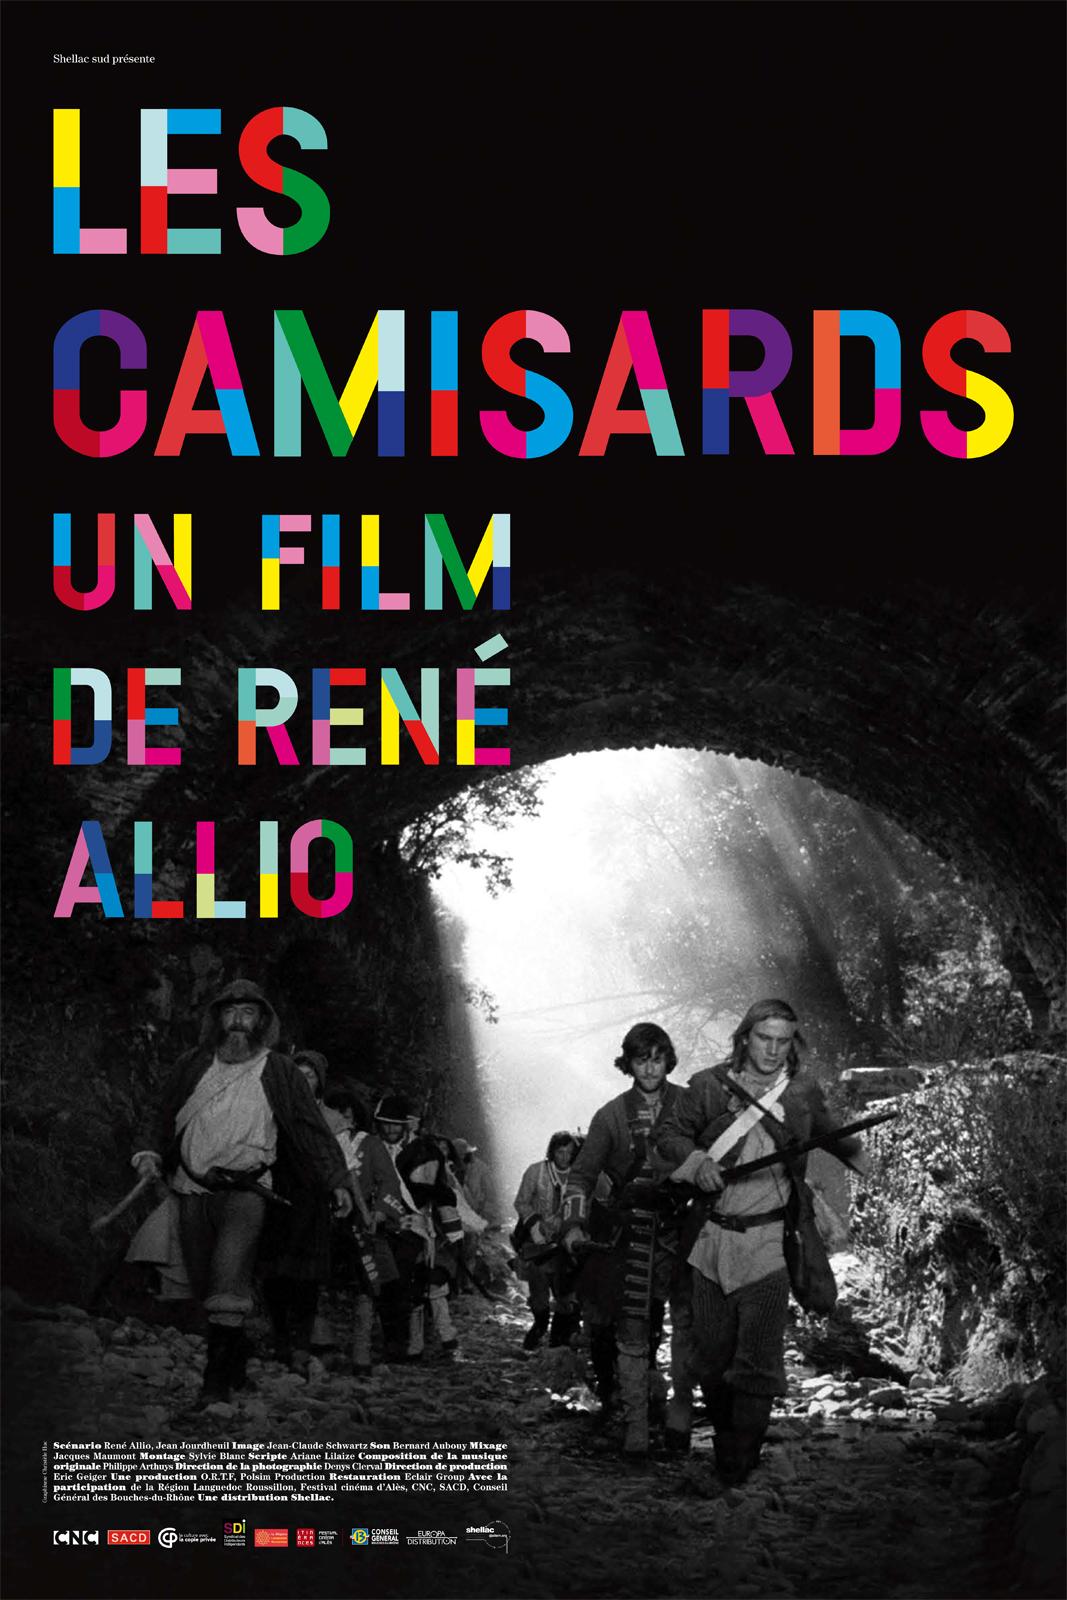 LES TÉLÉCHARGER CAMISARDS FILM